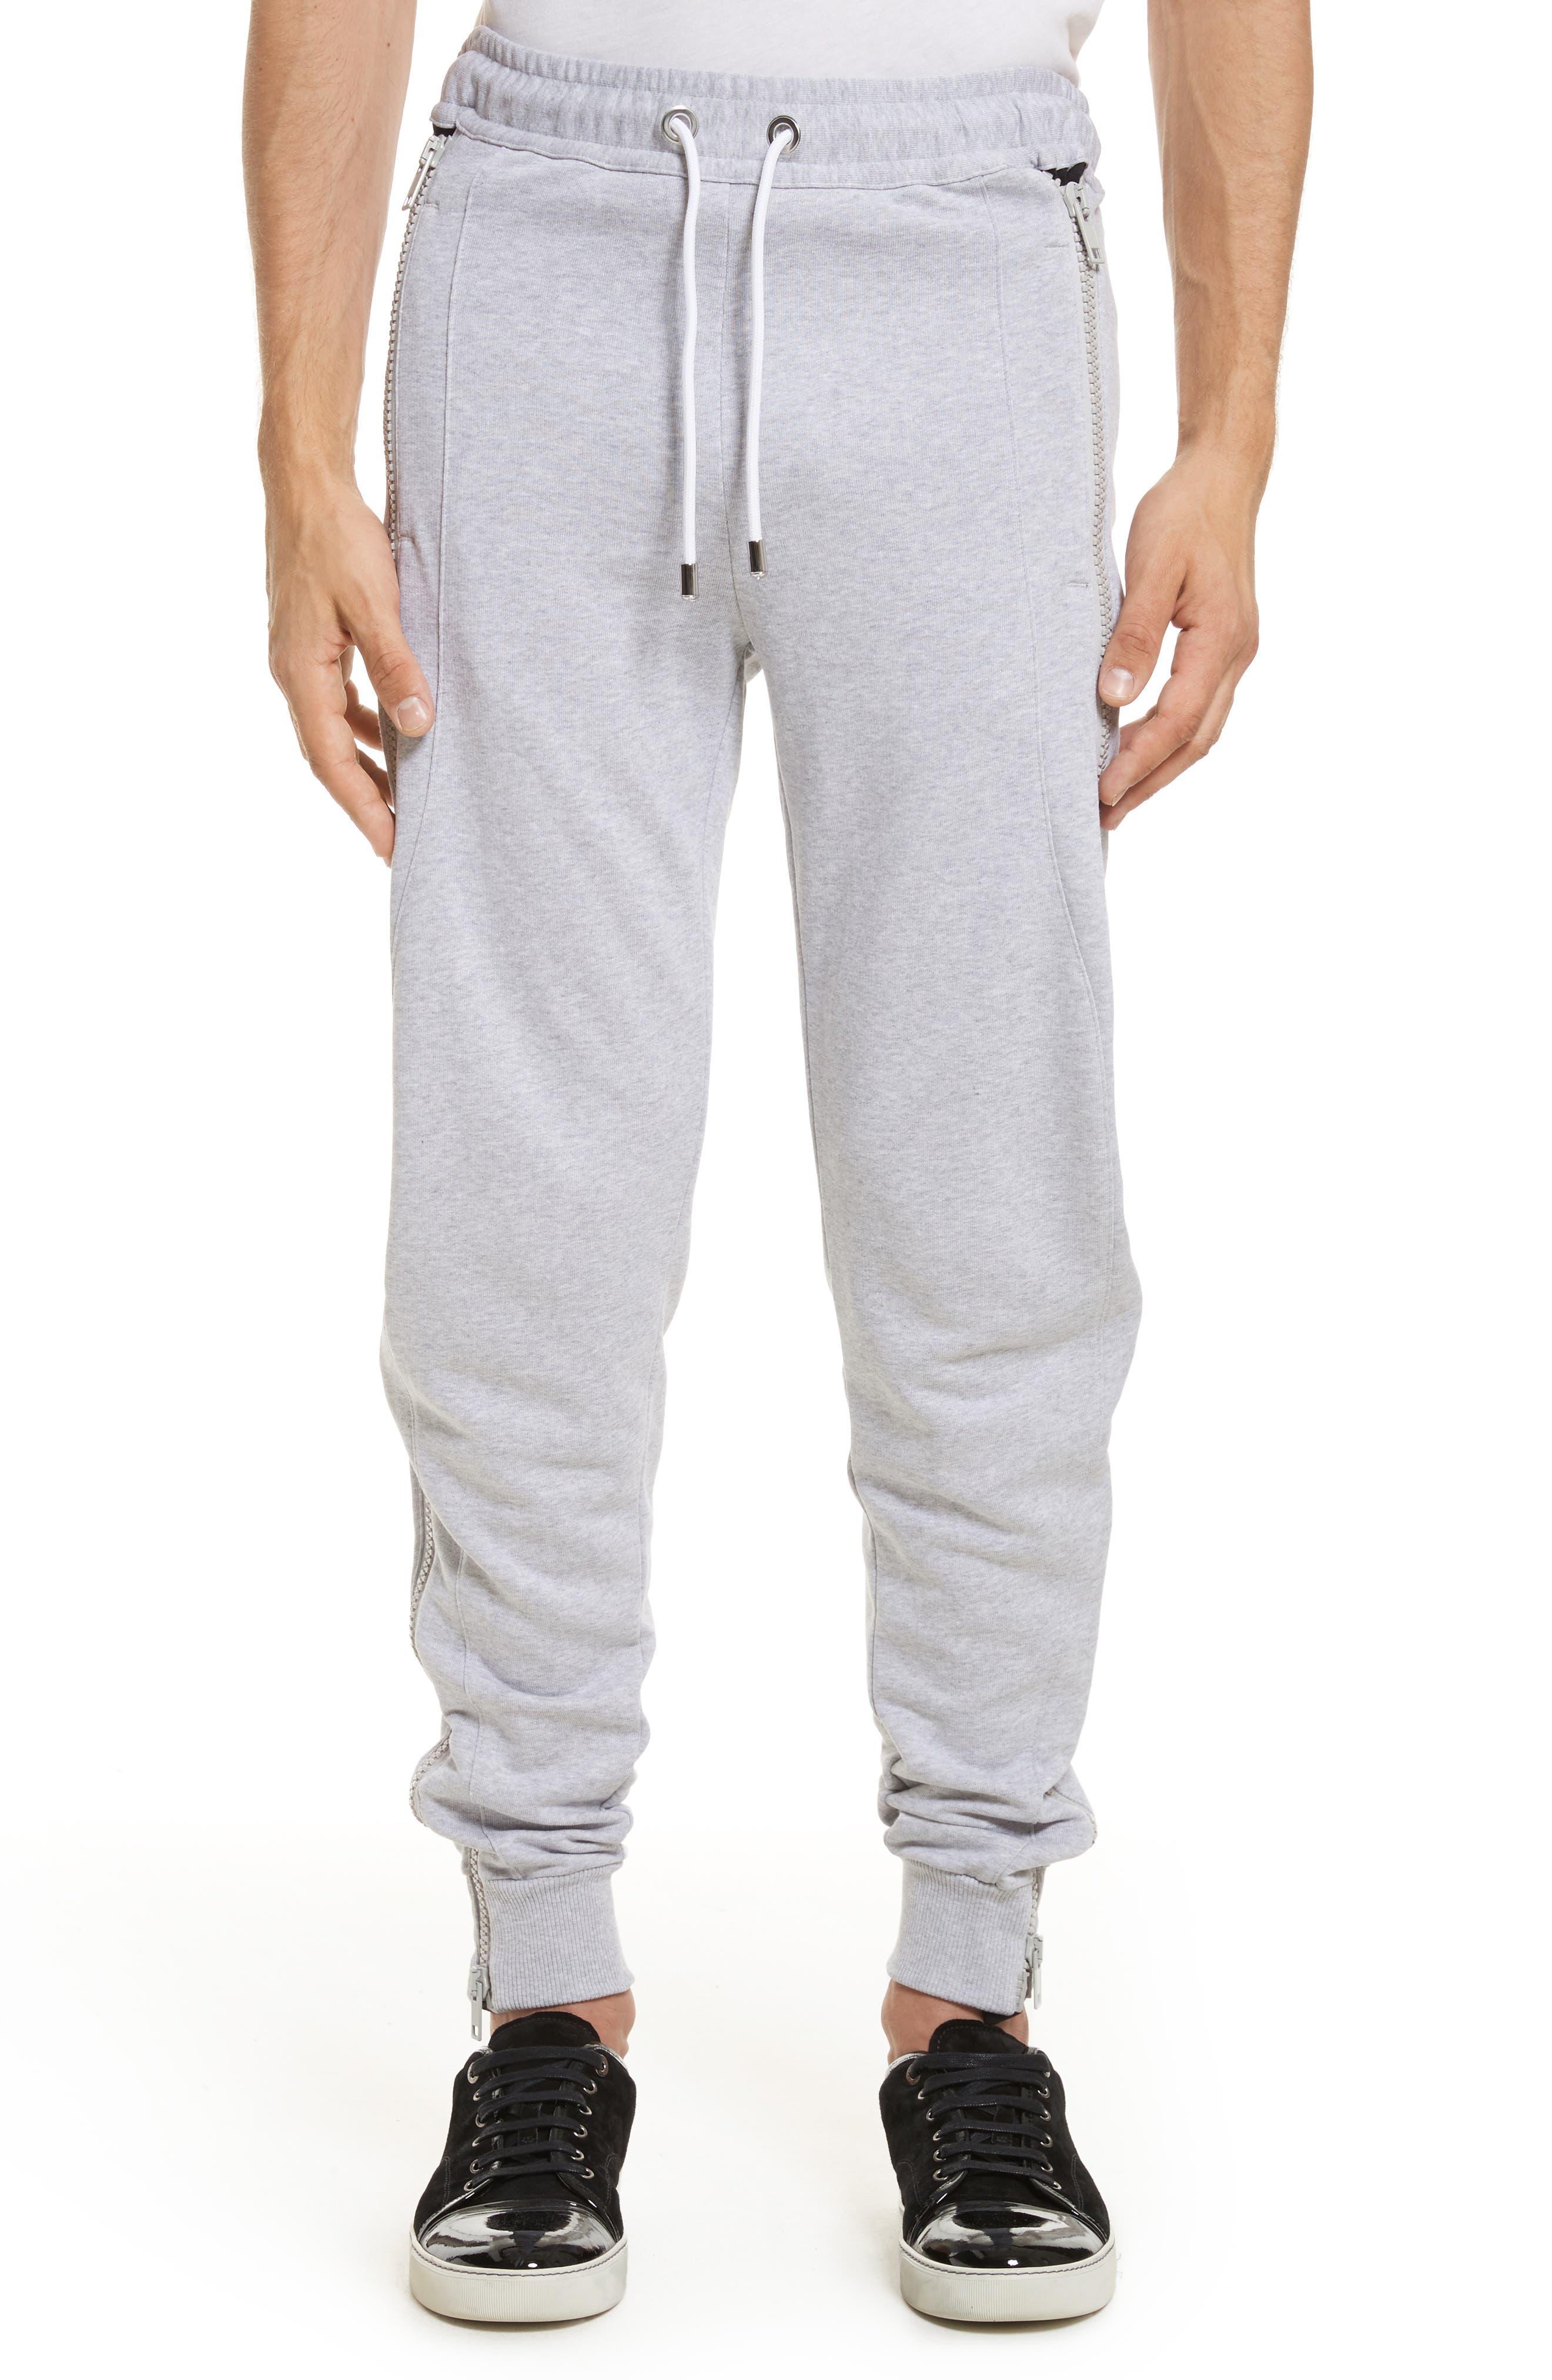 VERSUS by Versace Side Zip Sweatpants,                         Main,                         color, Grey